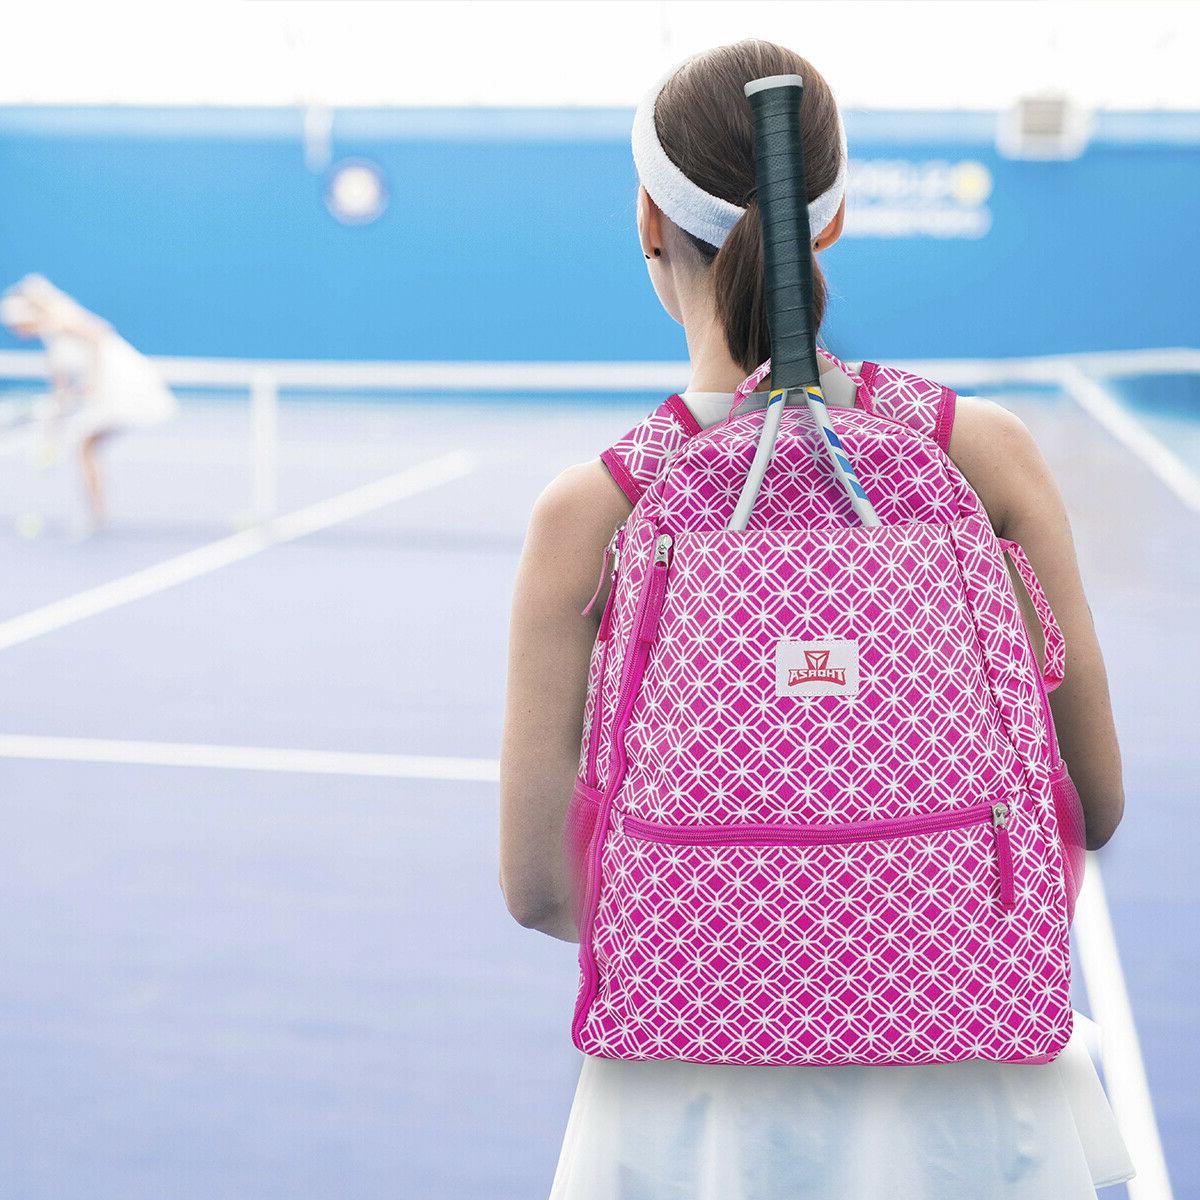 Tennis Racket Backpack for Women Balls,